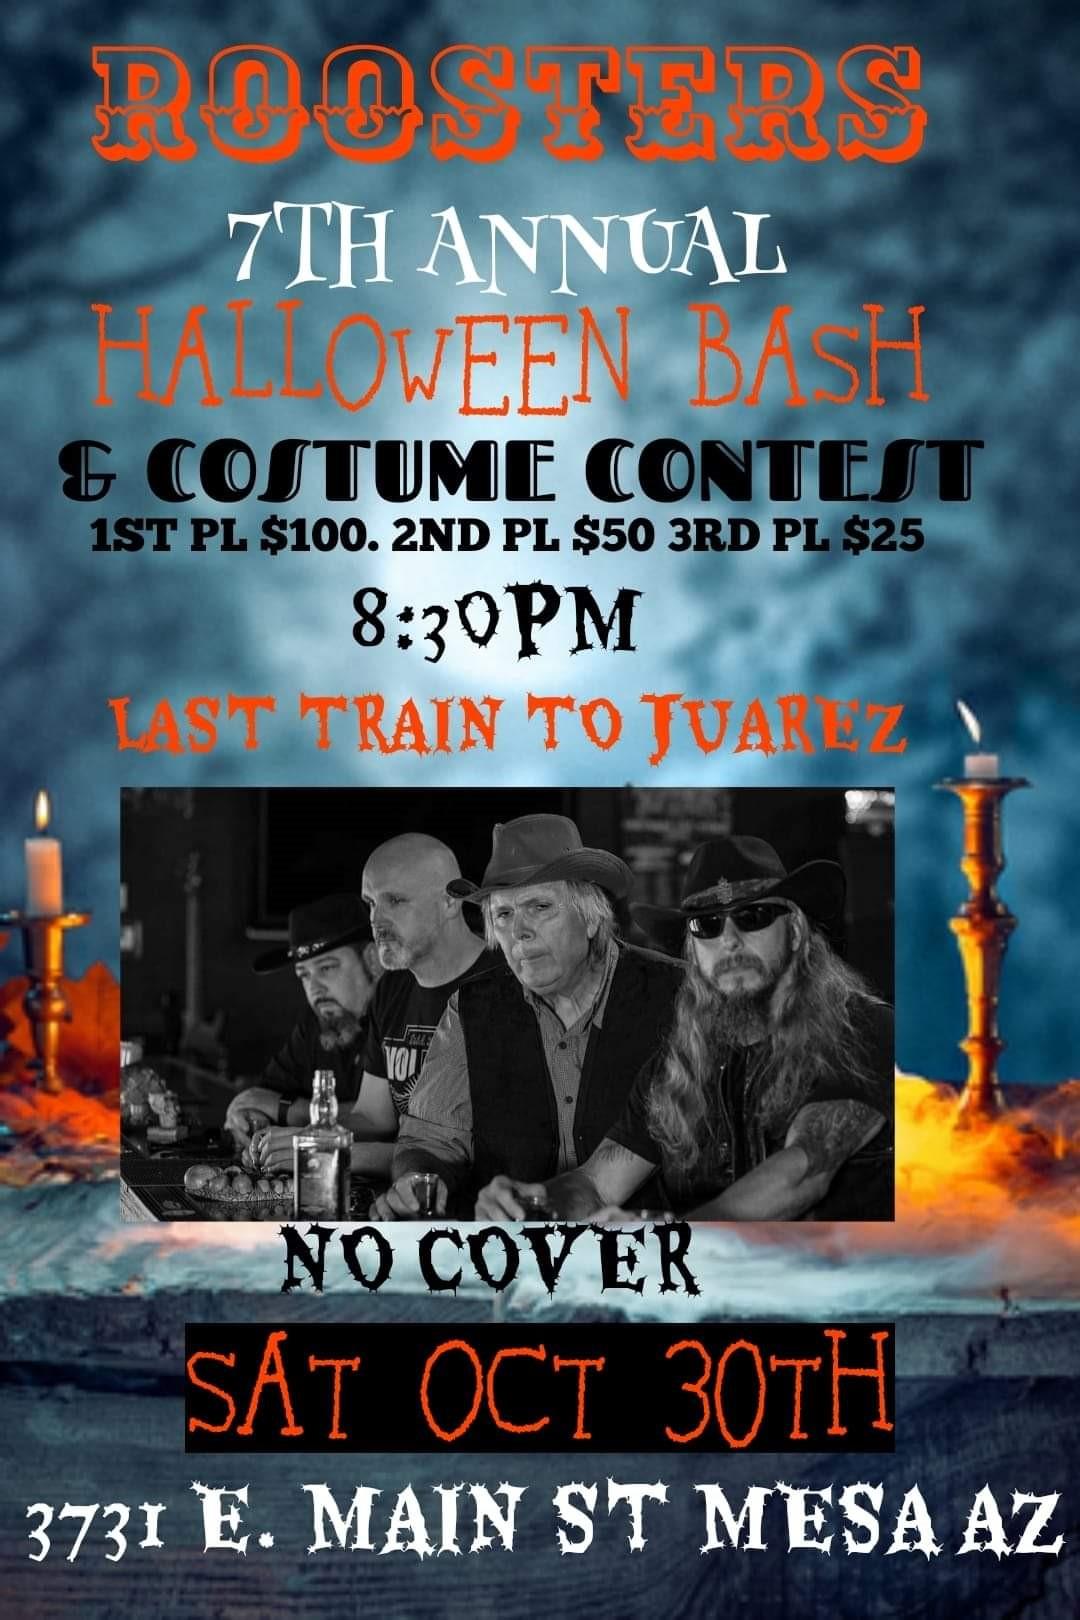 Halloween Bash & Costume Contest / With Last Train to Juarez